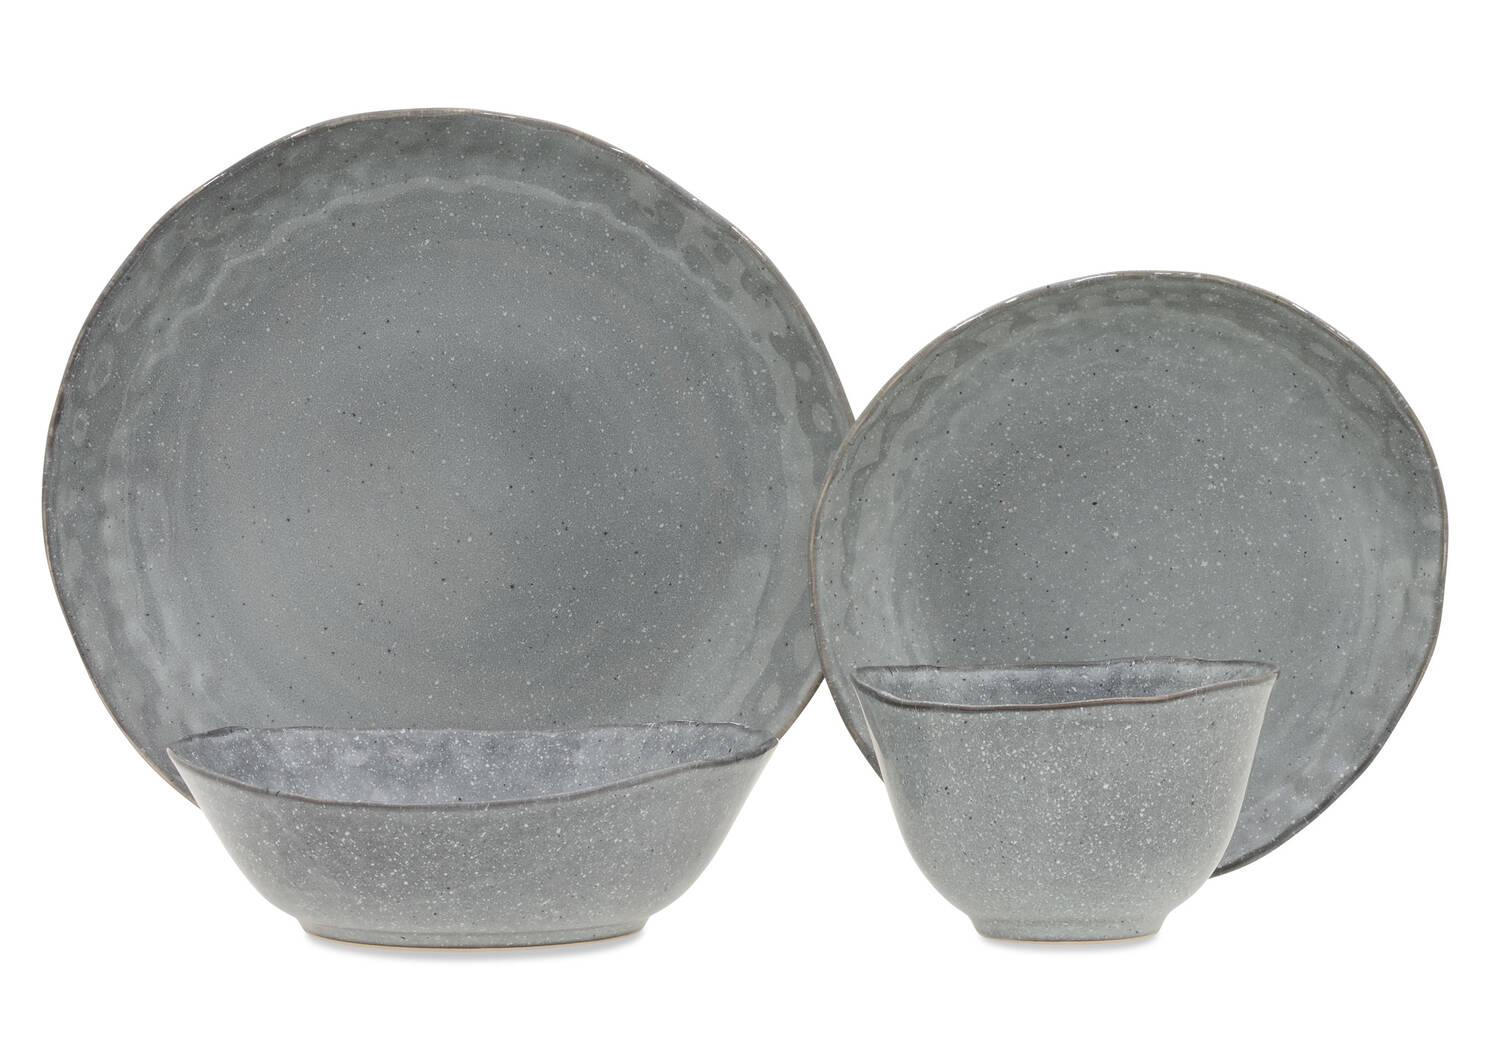 Crofton Glazed 16pc Dish Set